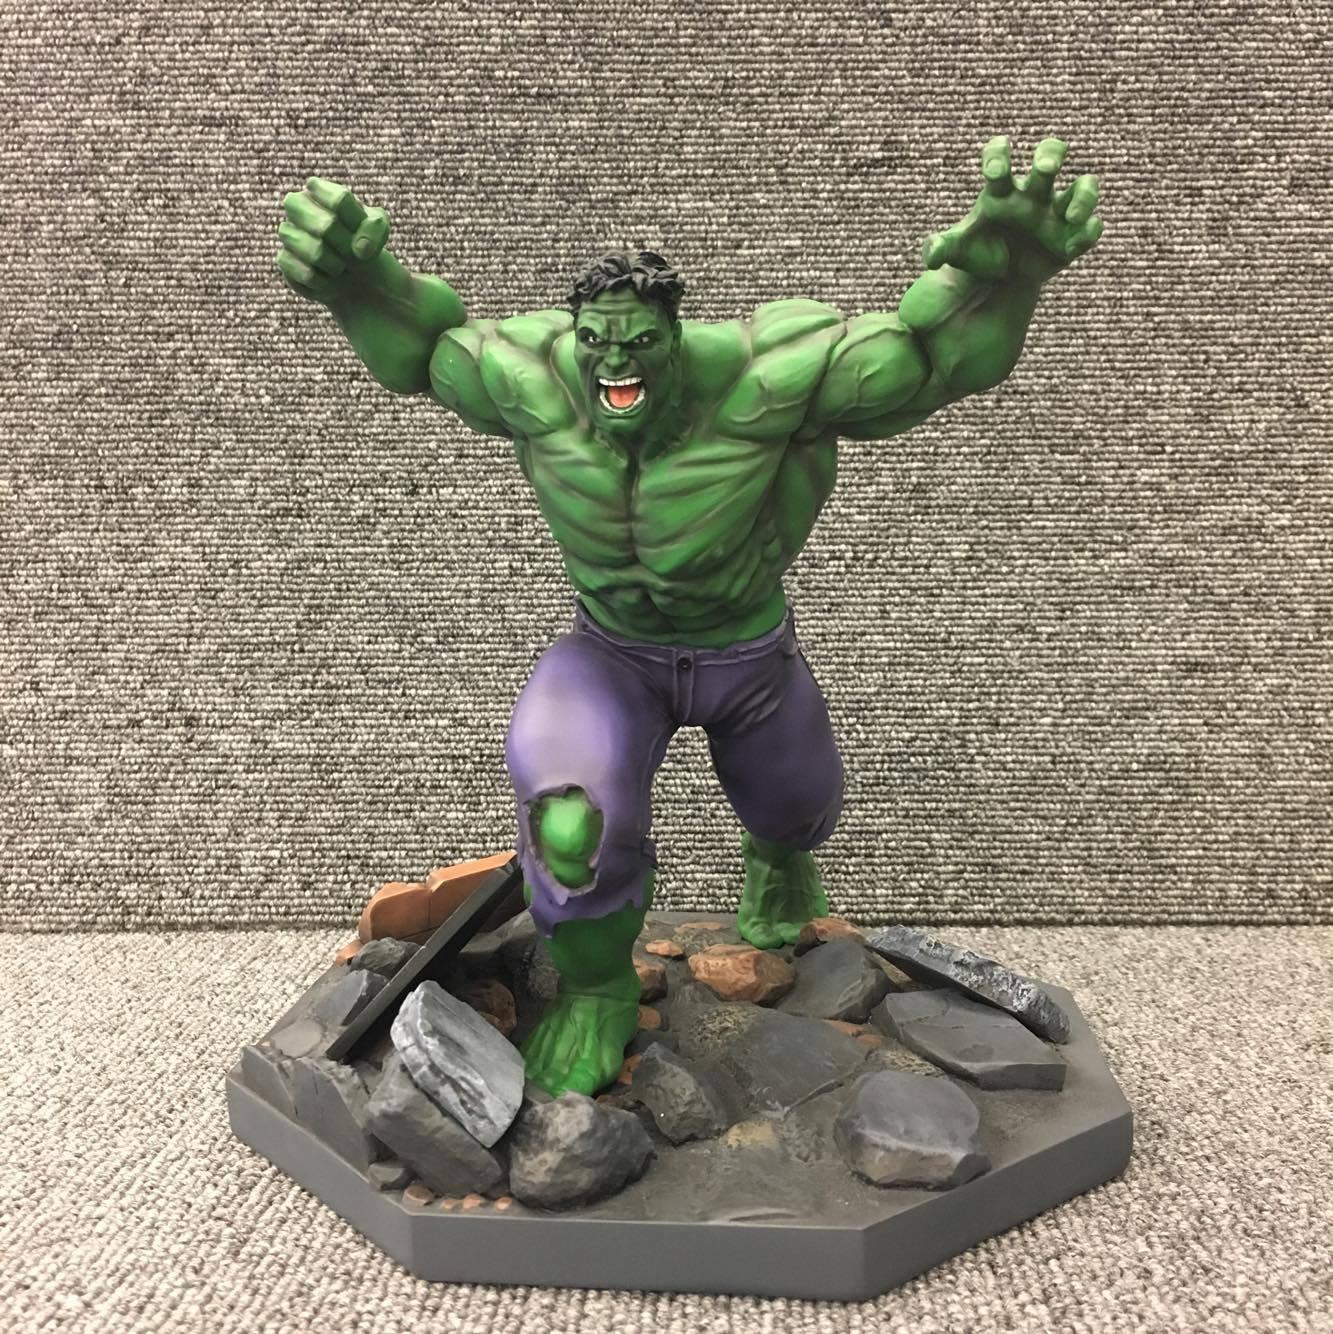 BEETLE 全新 BAIT x MARVEL HULK 綠巨人浩克 復仇者聯盟 公仔 玩偶 聖誕禮物